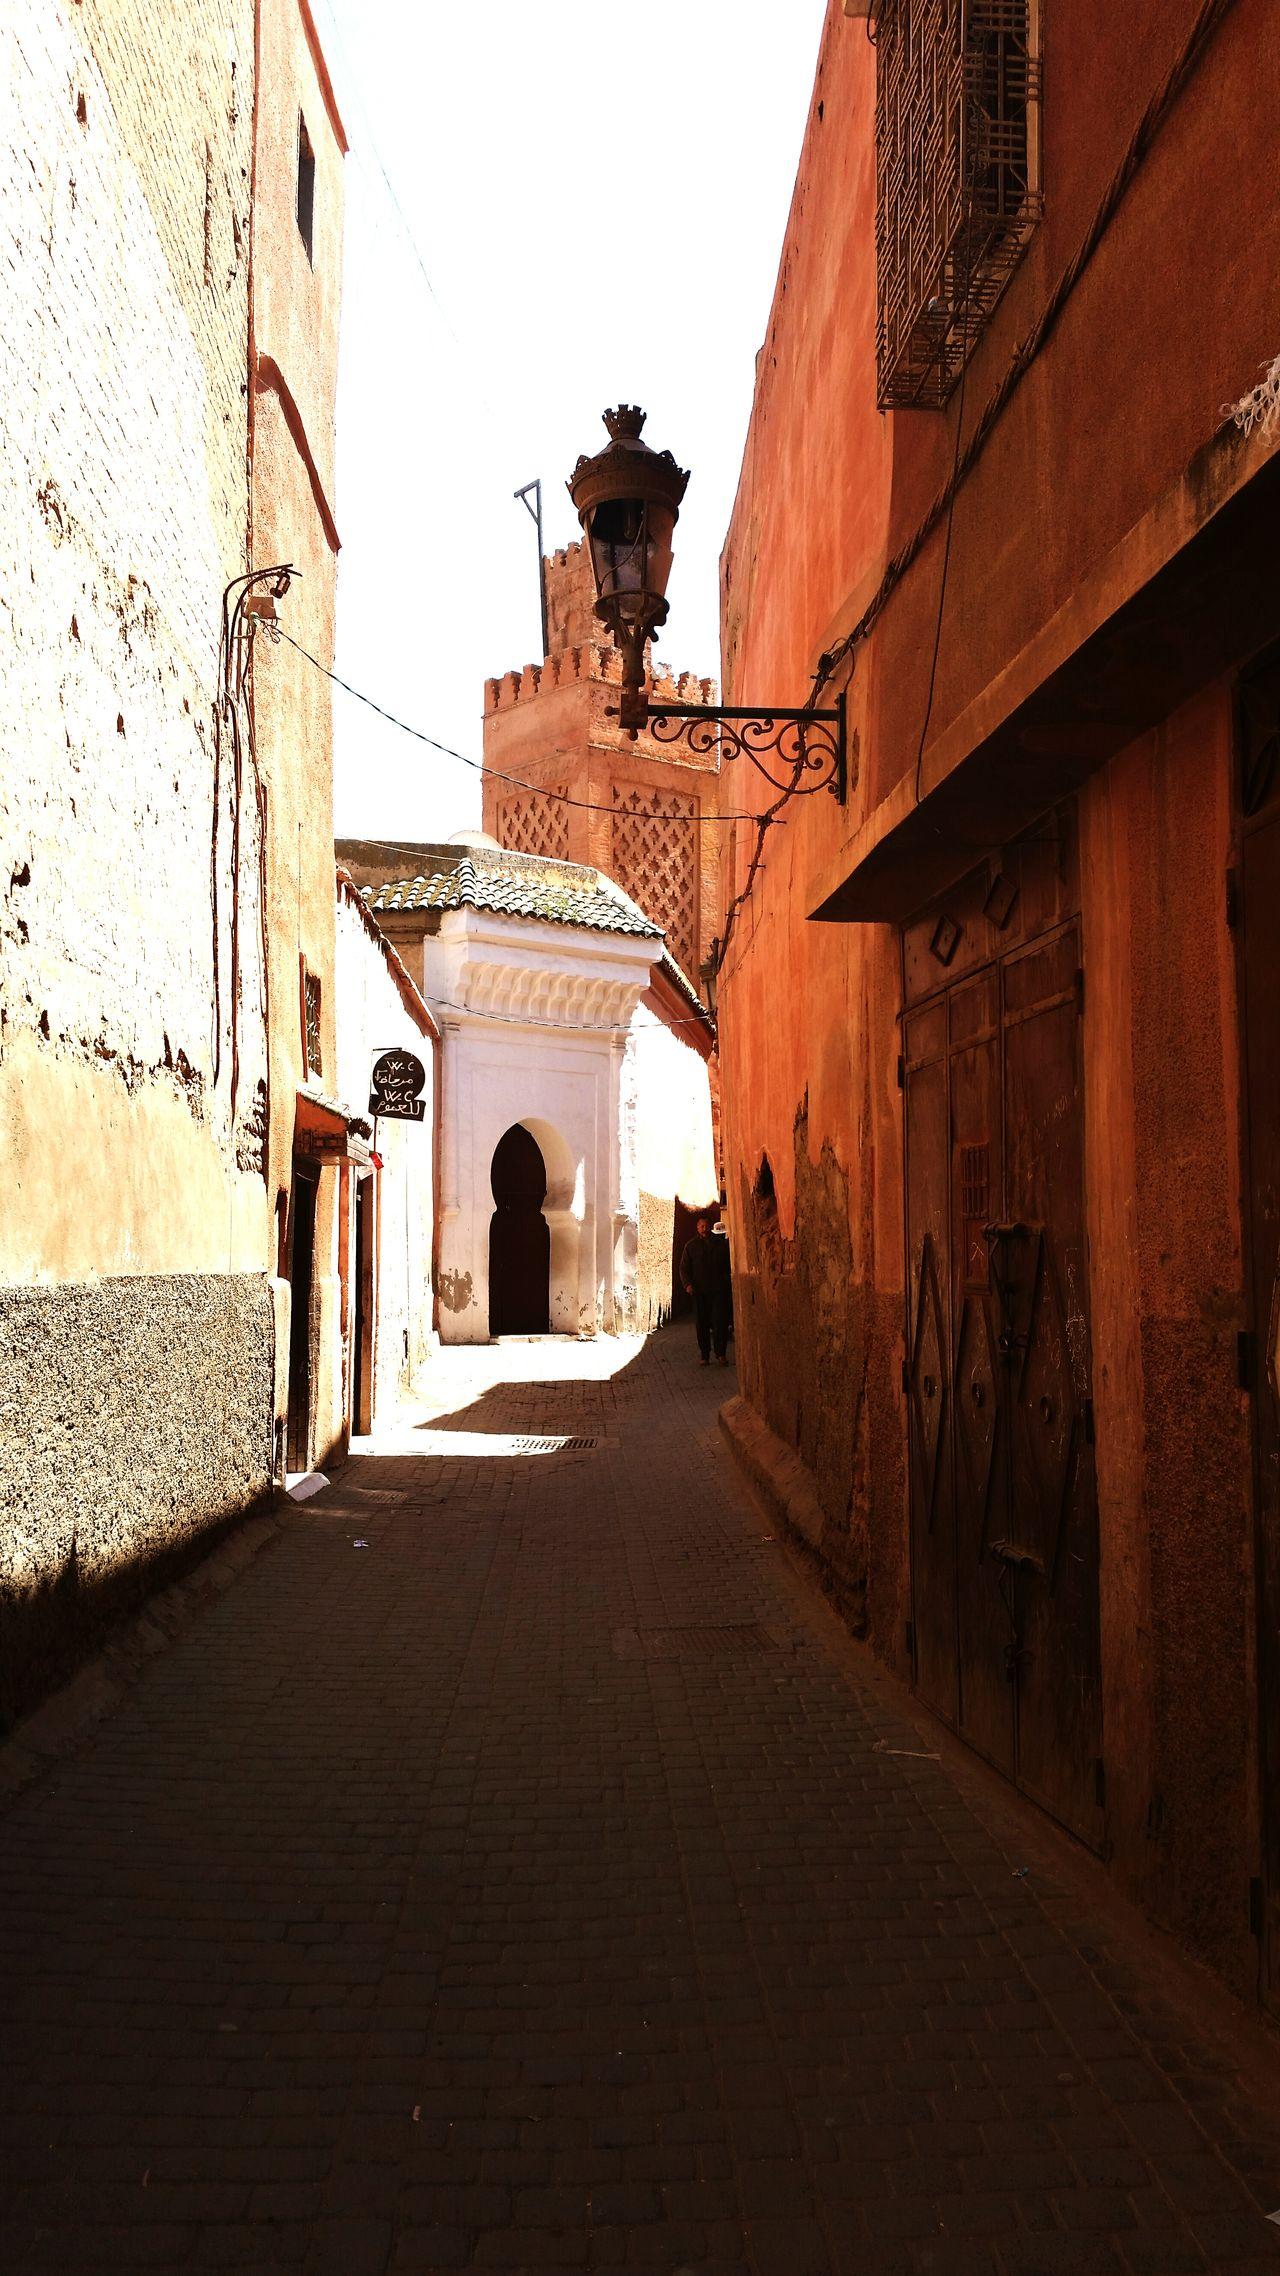 Marrakech Morroco Streetphotography Street Art Streetphoto_color Streetphoto Streetportrait Walk This Way Light And Shadow Sun Light